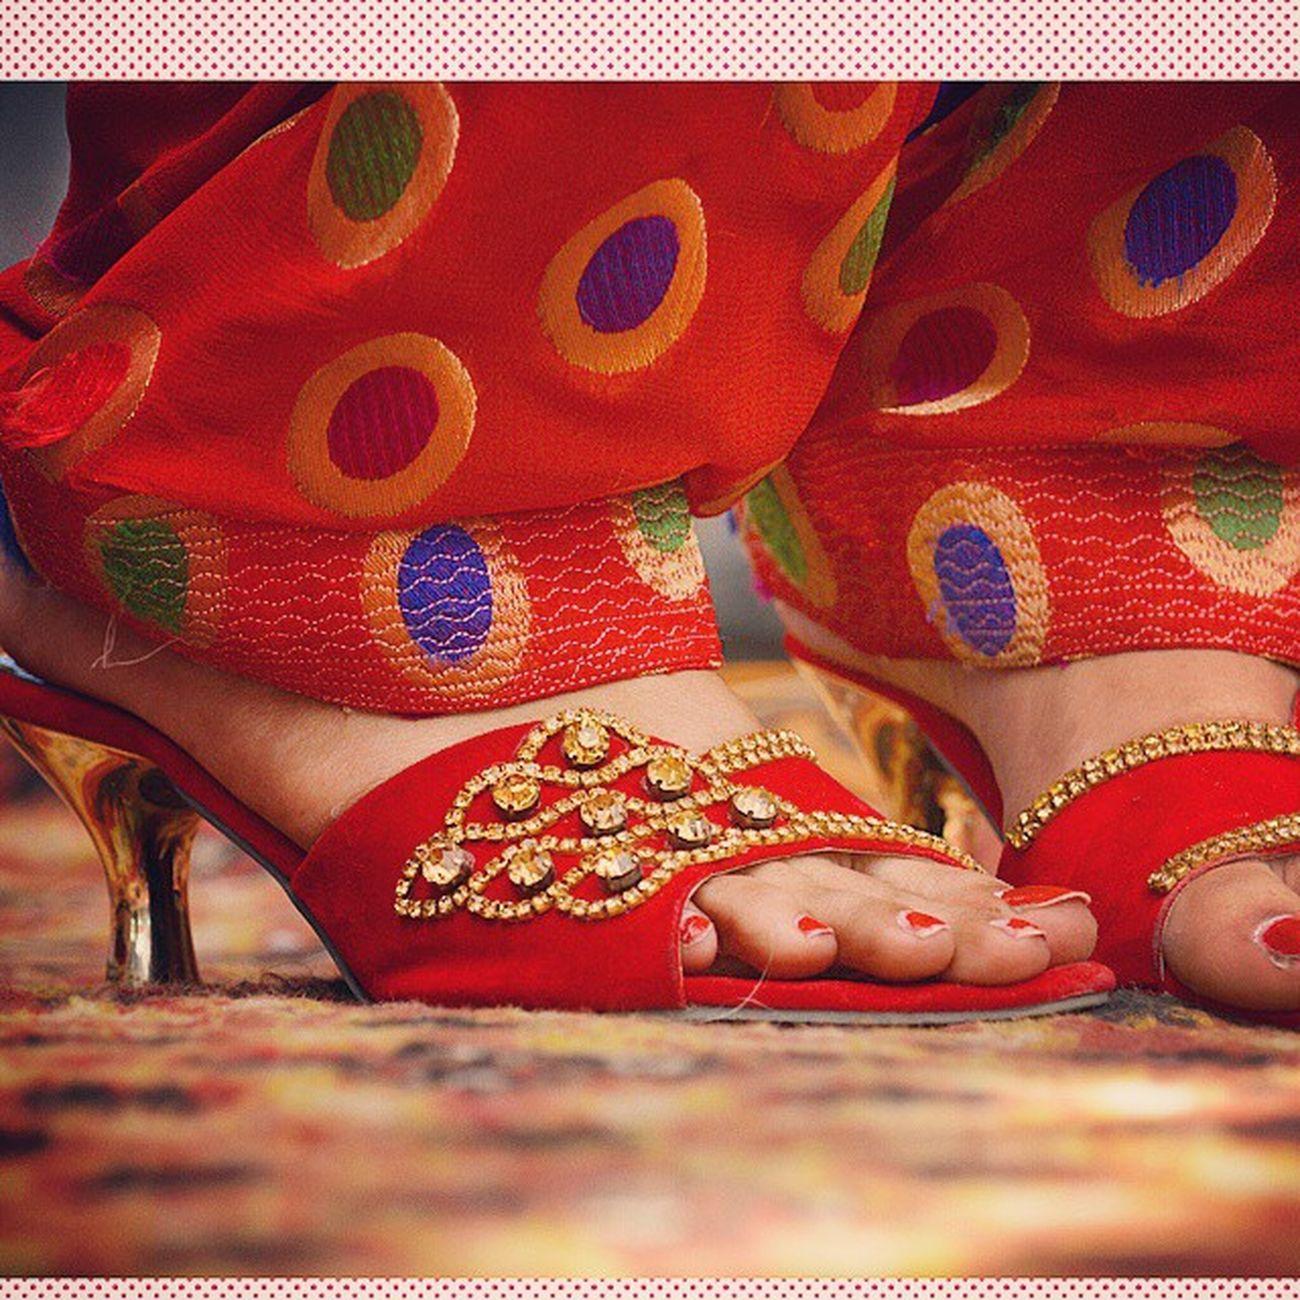 Kehndi MAI Haan Jatti Pariyan Toh Sohni Par Tere Camera Di Gall Horr Channa Gagans_photography Chitchor Instalike Instapic Kisaanmela